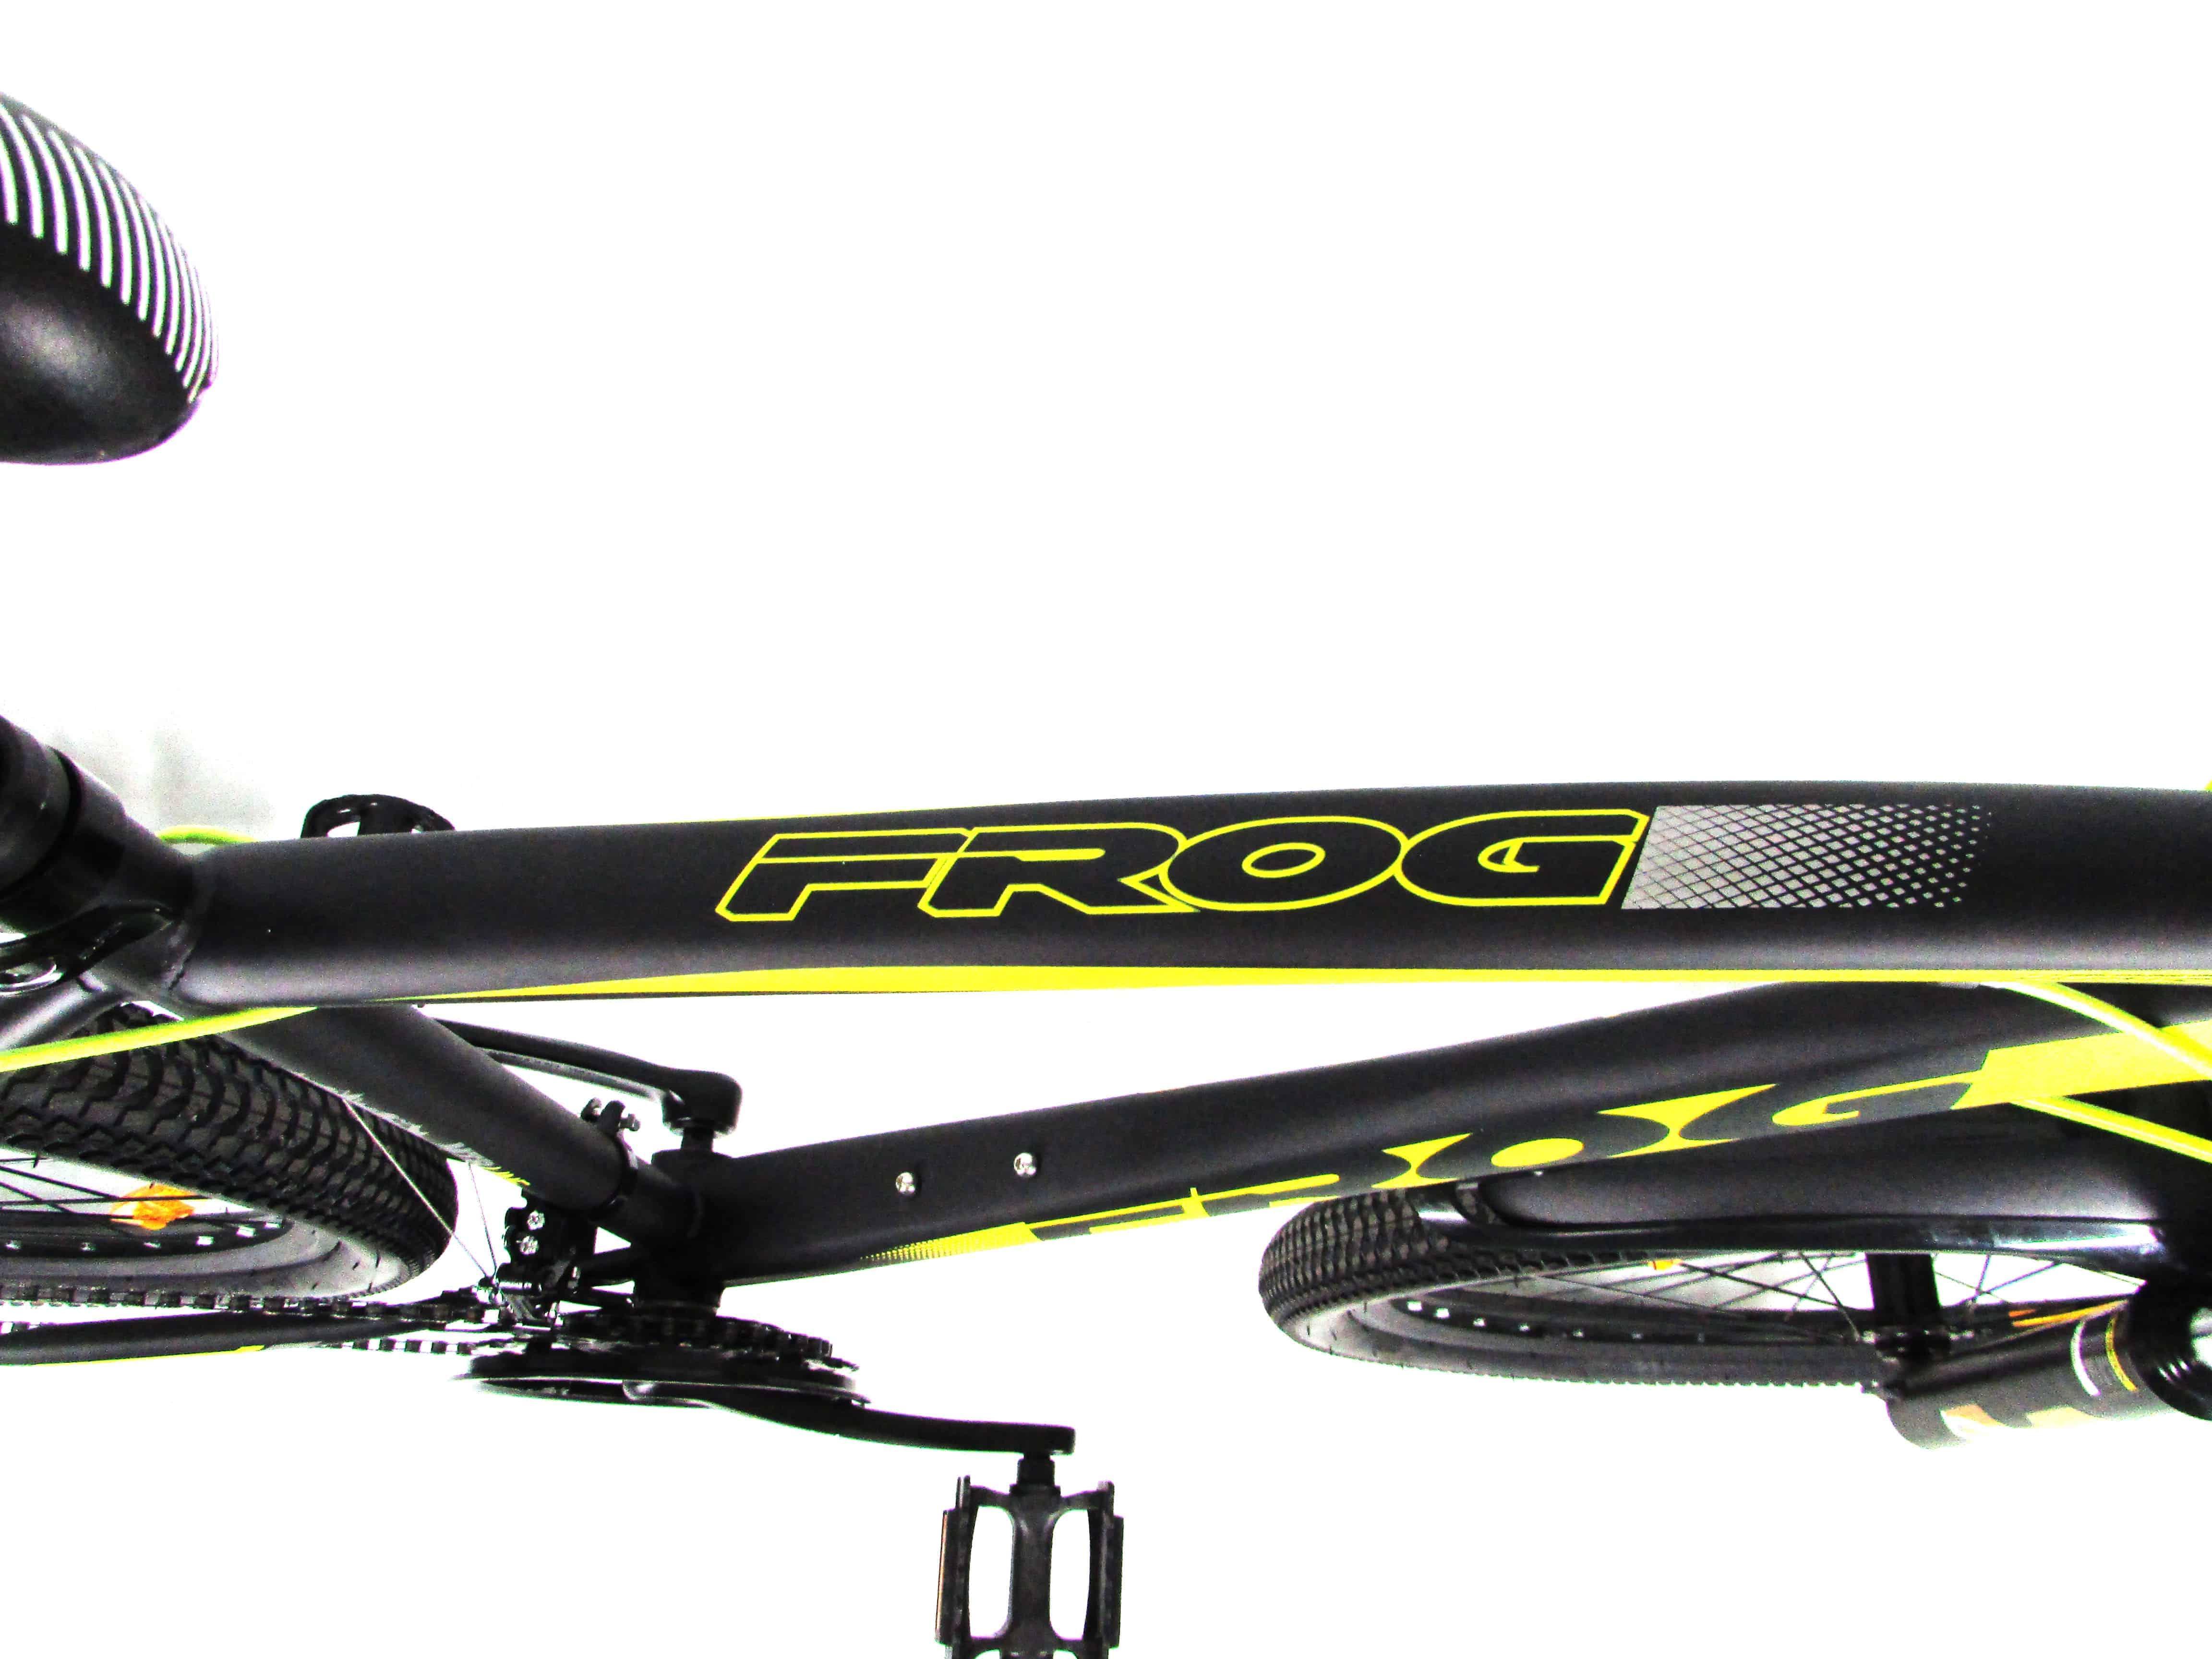 Vortex Z501 26 Black Yellow image 6